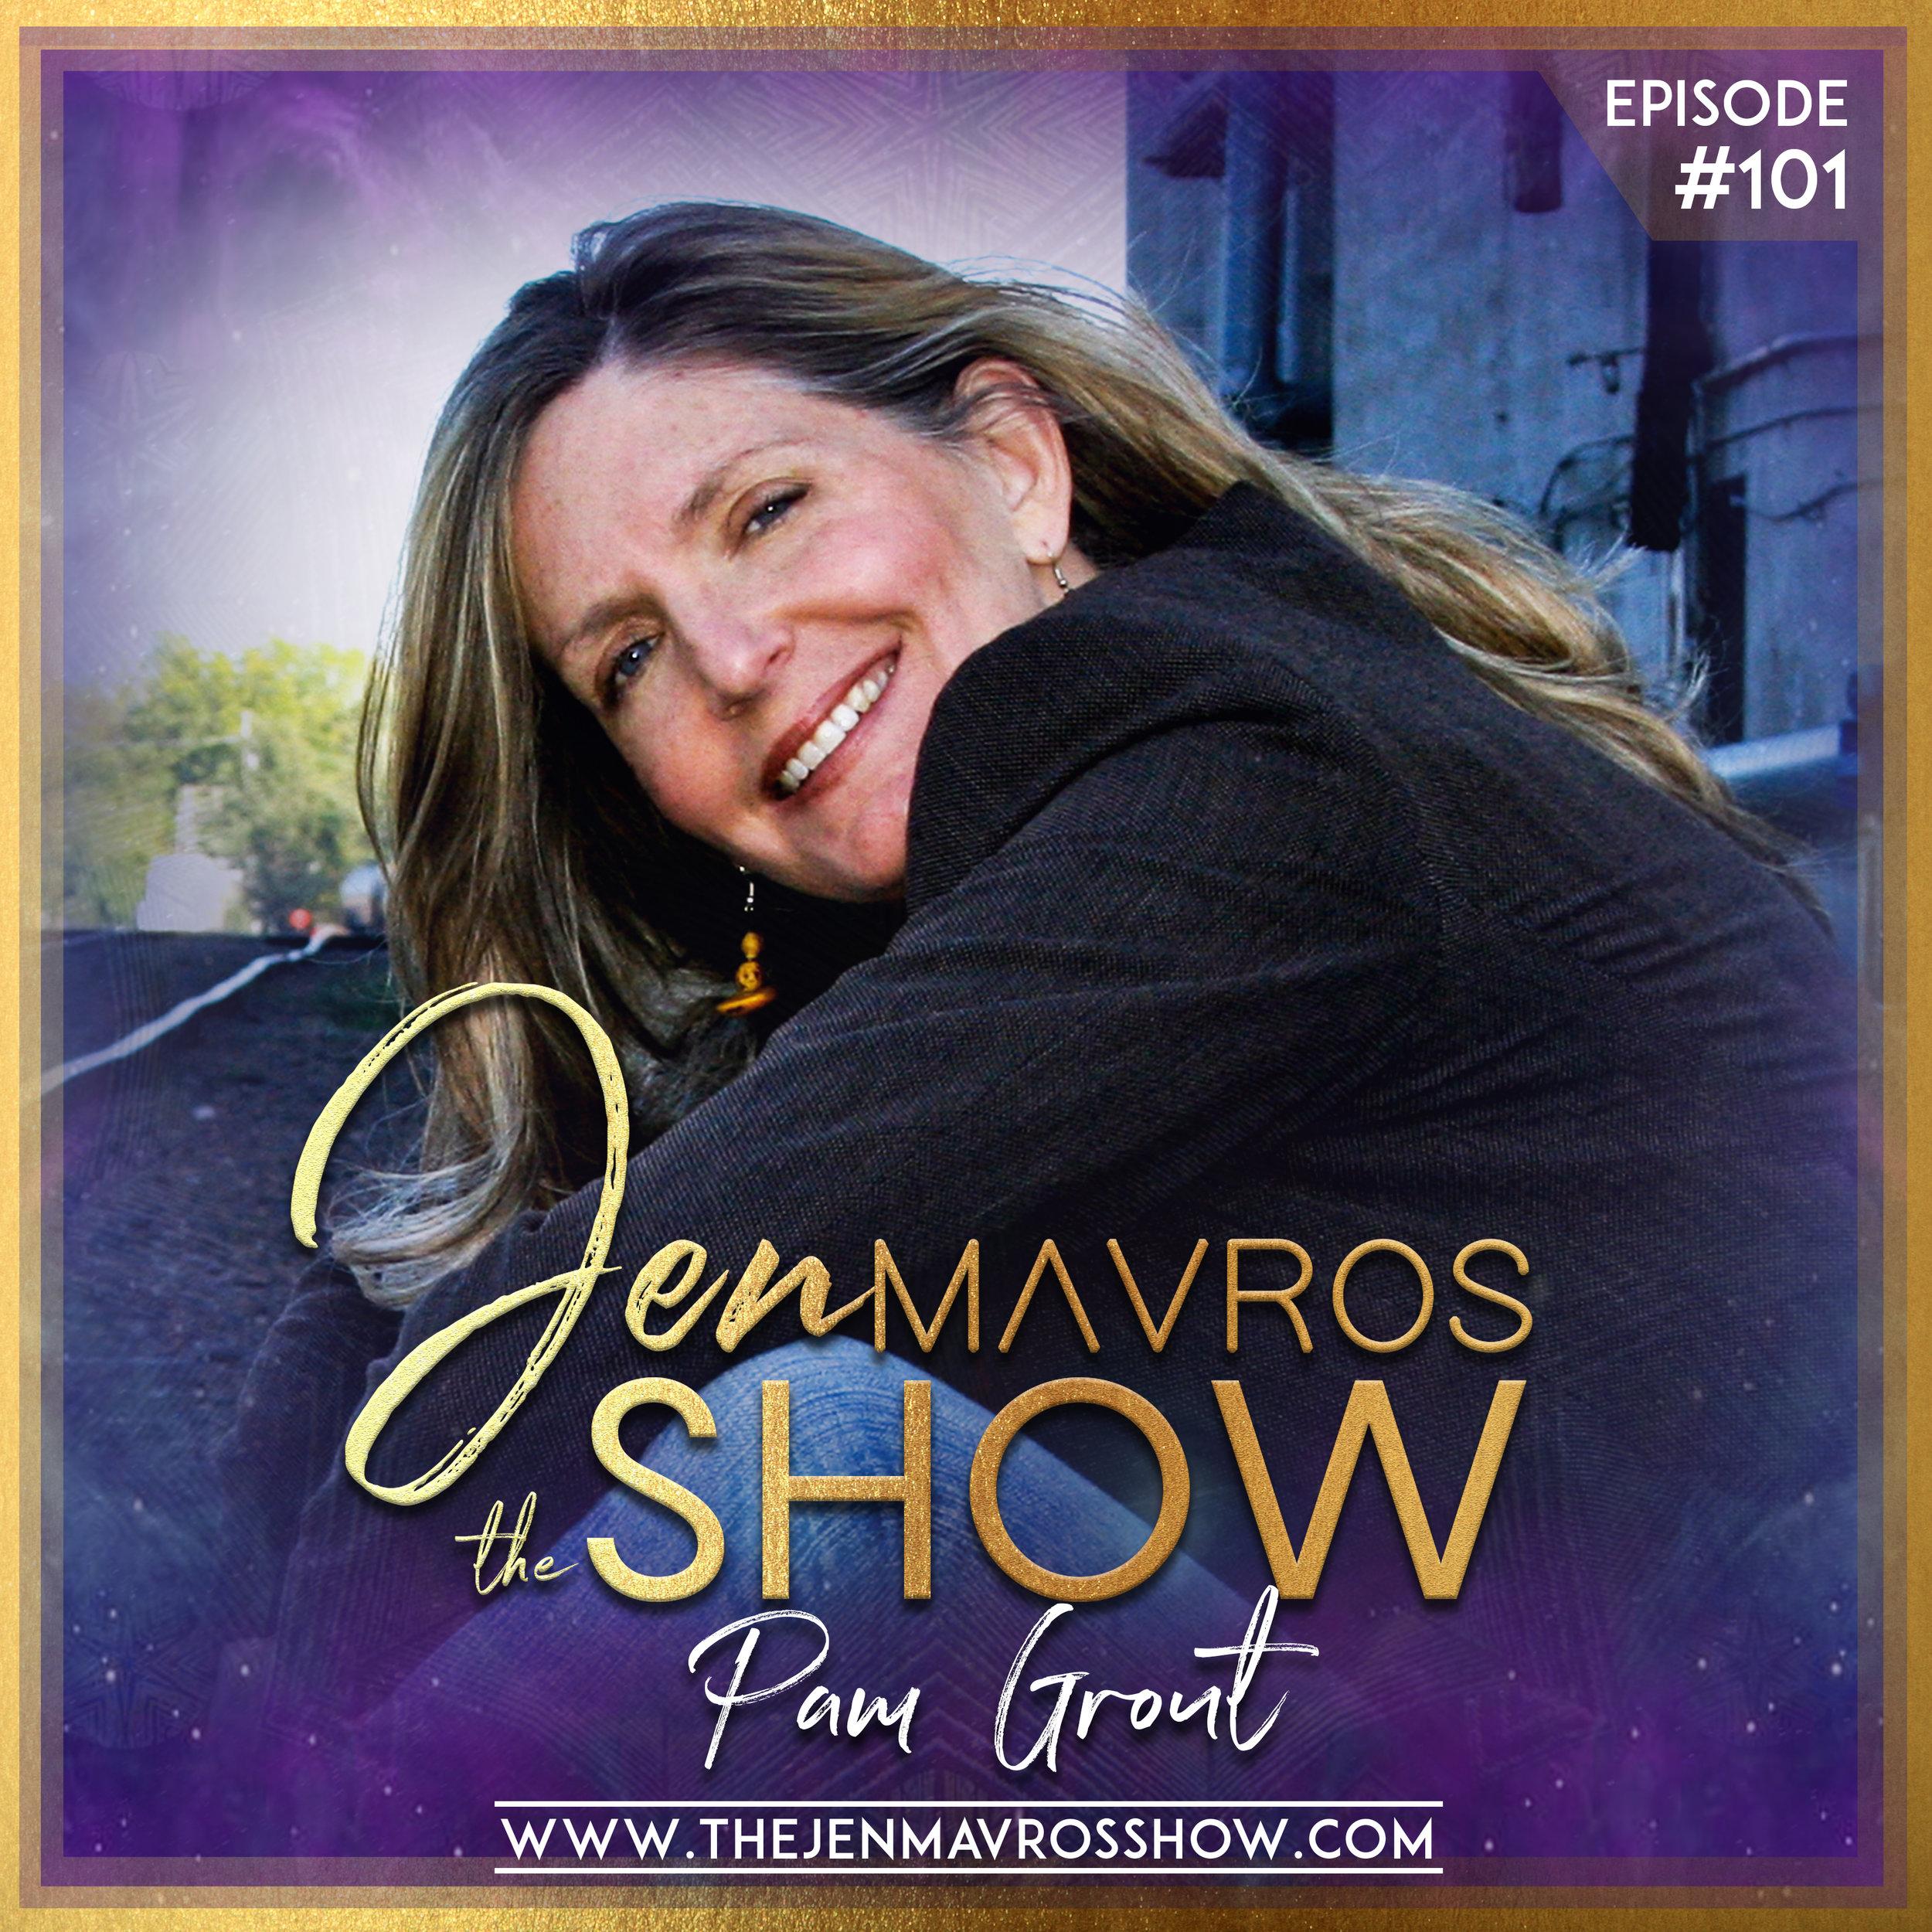 Pam Grout - Creativity & Conscious Creation